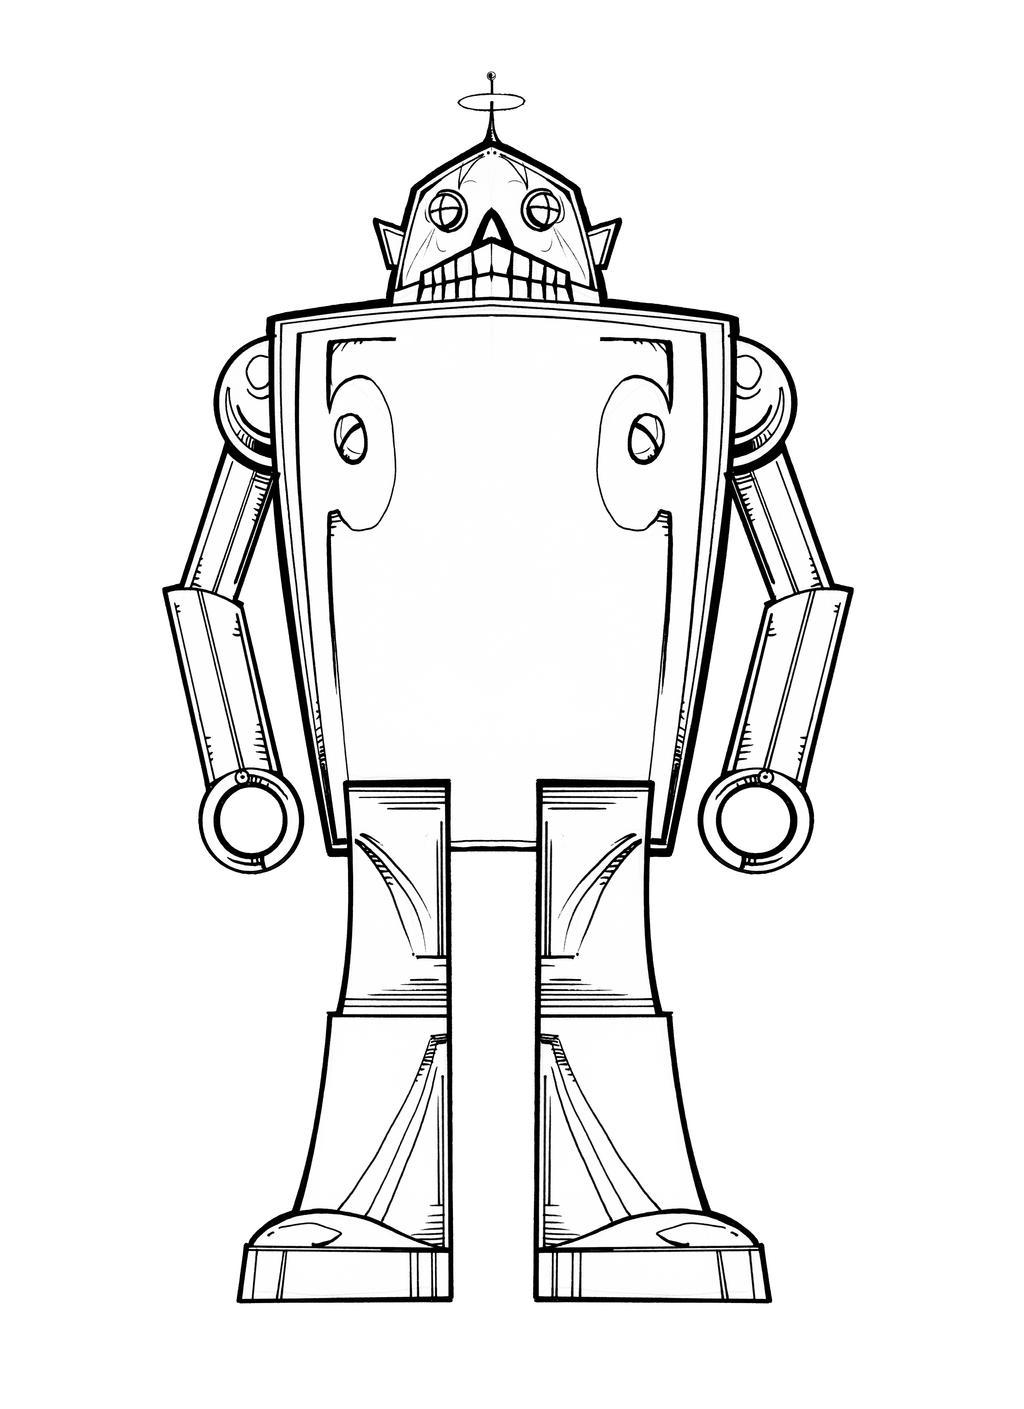 Line Art Robot : So long sucker robot line art by mjbivouac on deviantart